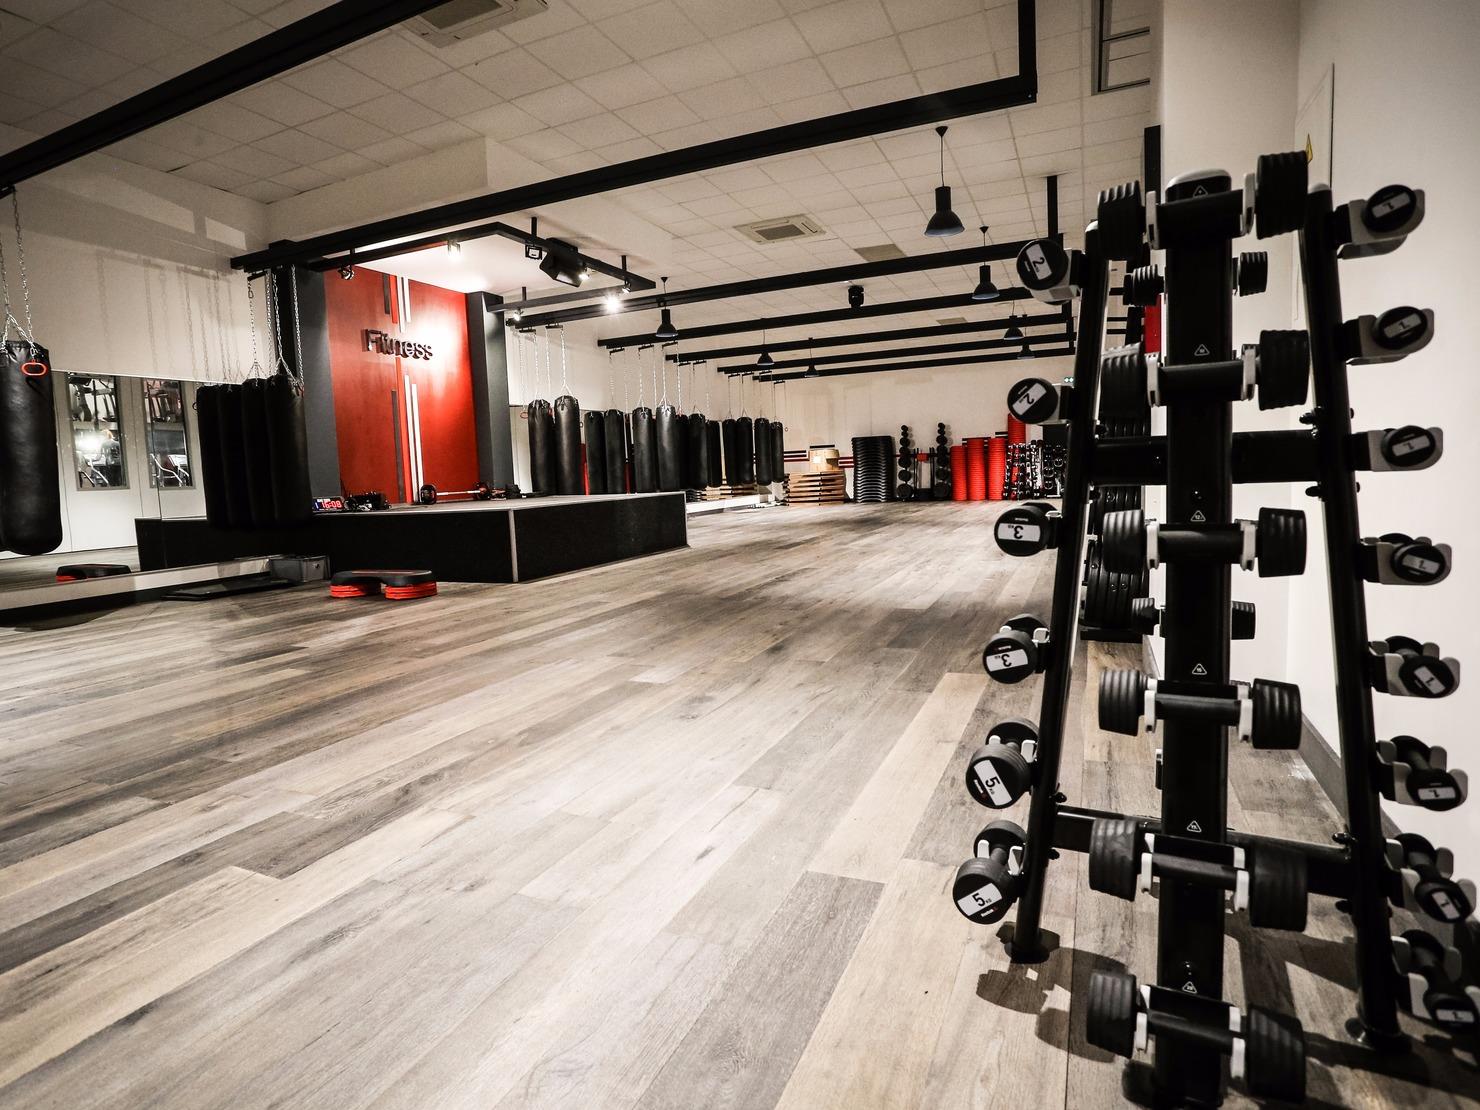 wellness sport club marseille le prado tarifs avis horaires essai gratuit. Black Bedroom Furniture Sets. Home Design Ideas